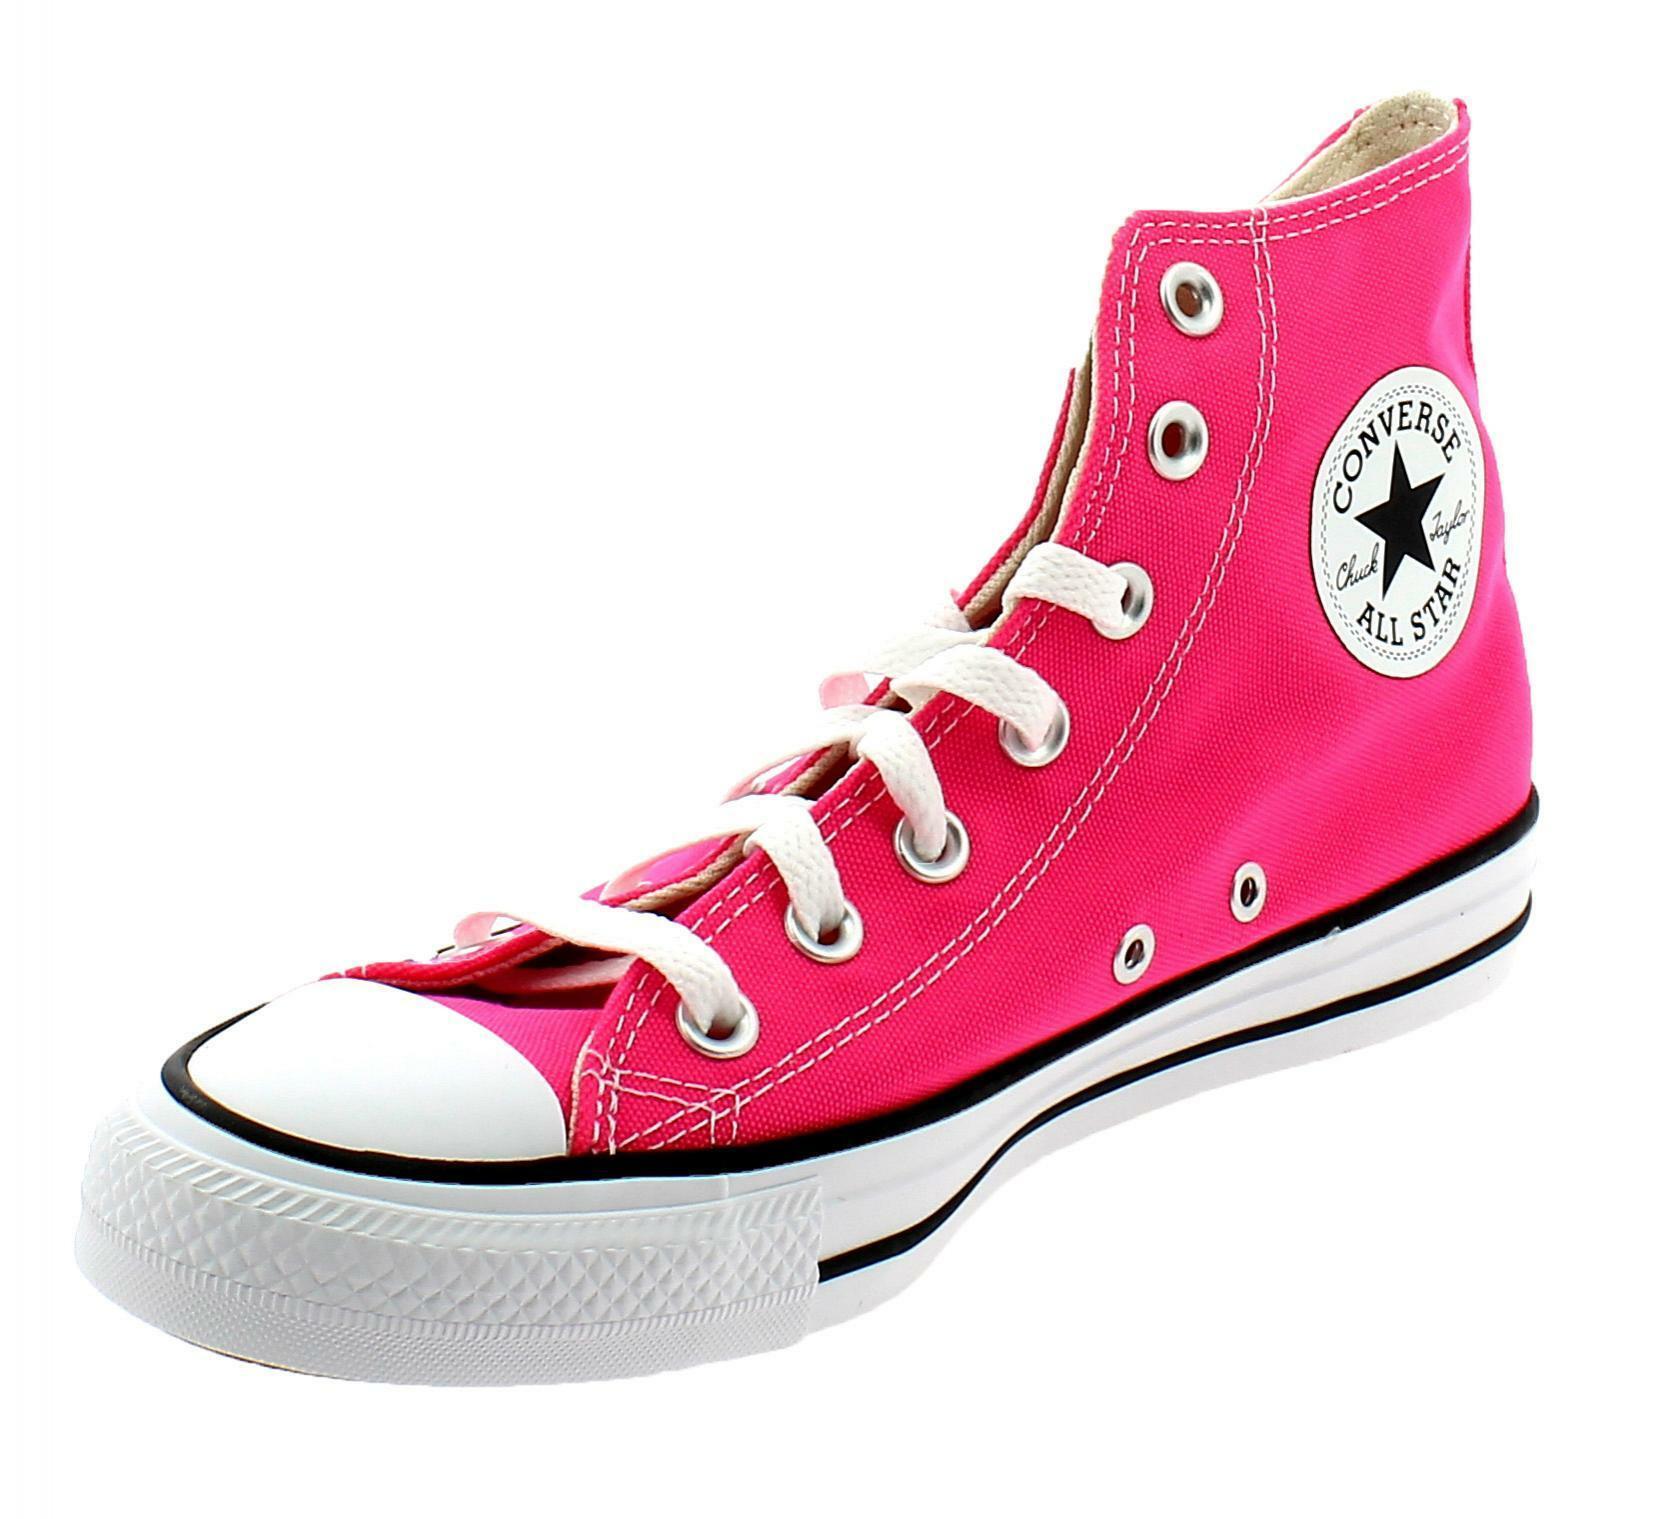 Converse scarpe sportive converse ctas hi ox 170155c donna rosa